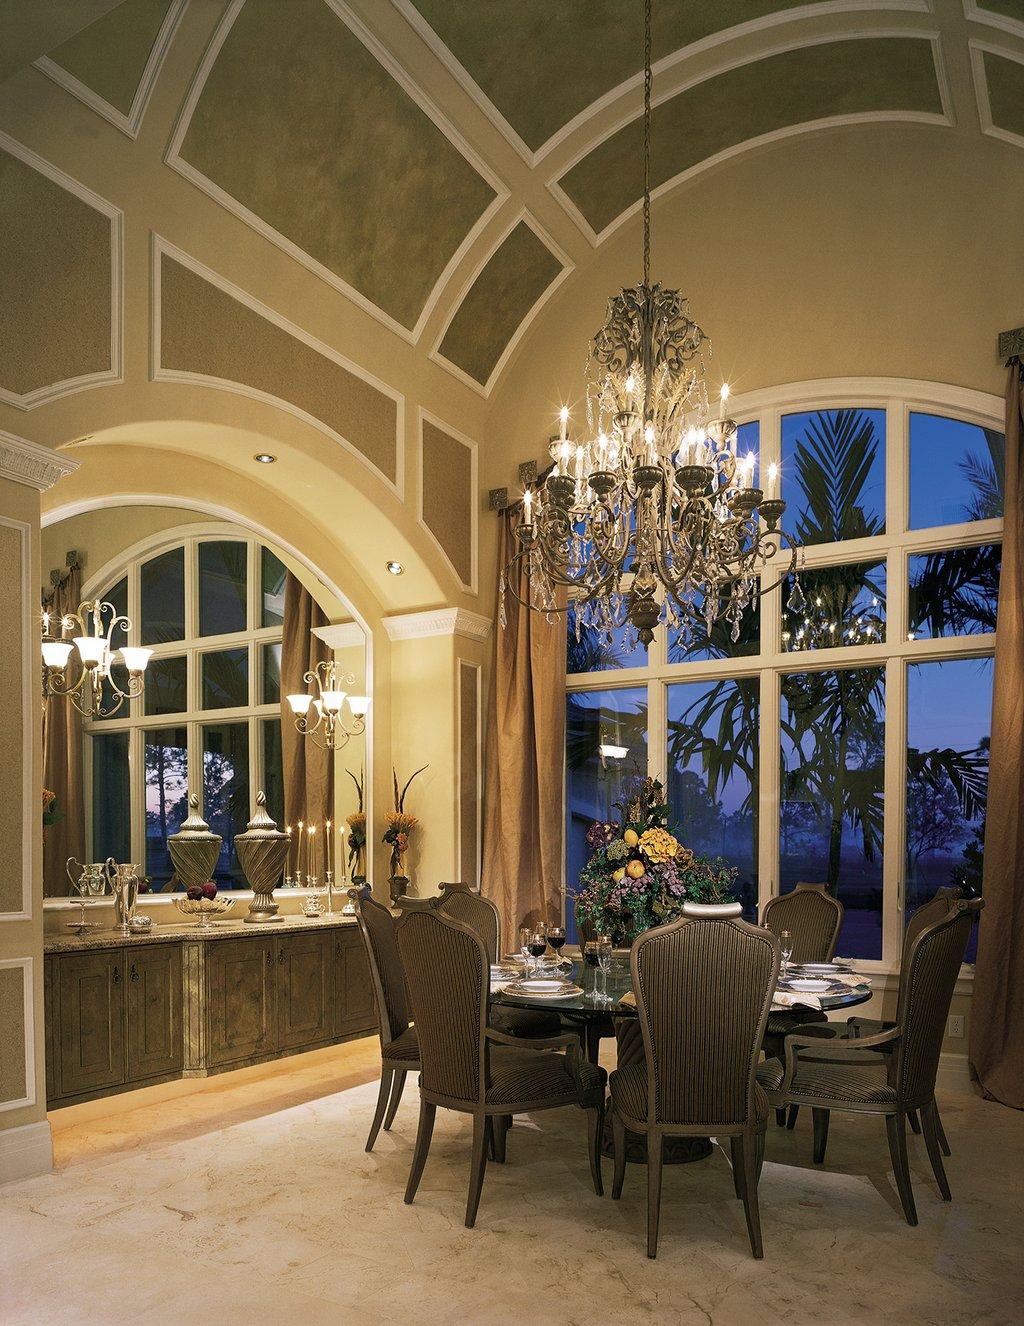 Living Room Interior Design Pdf: Mediterranean Style House Plan